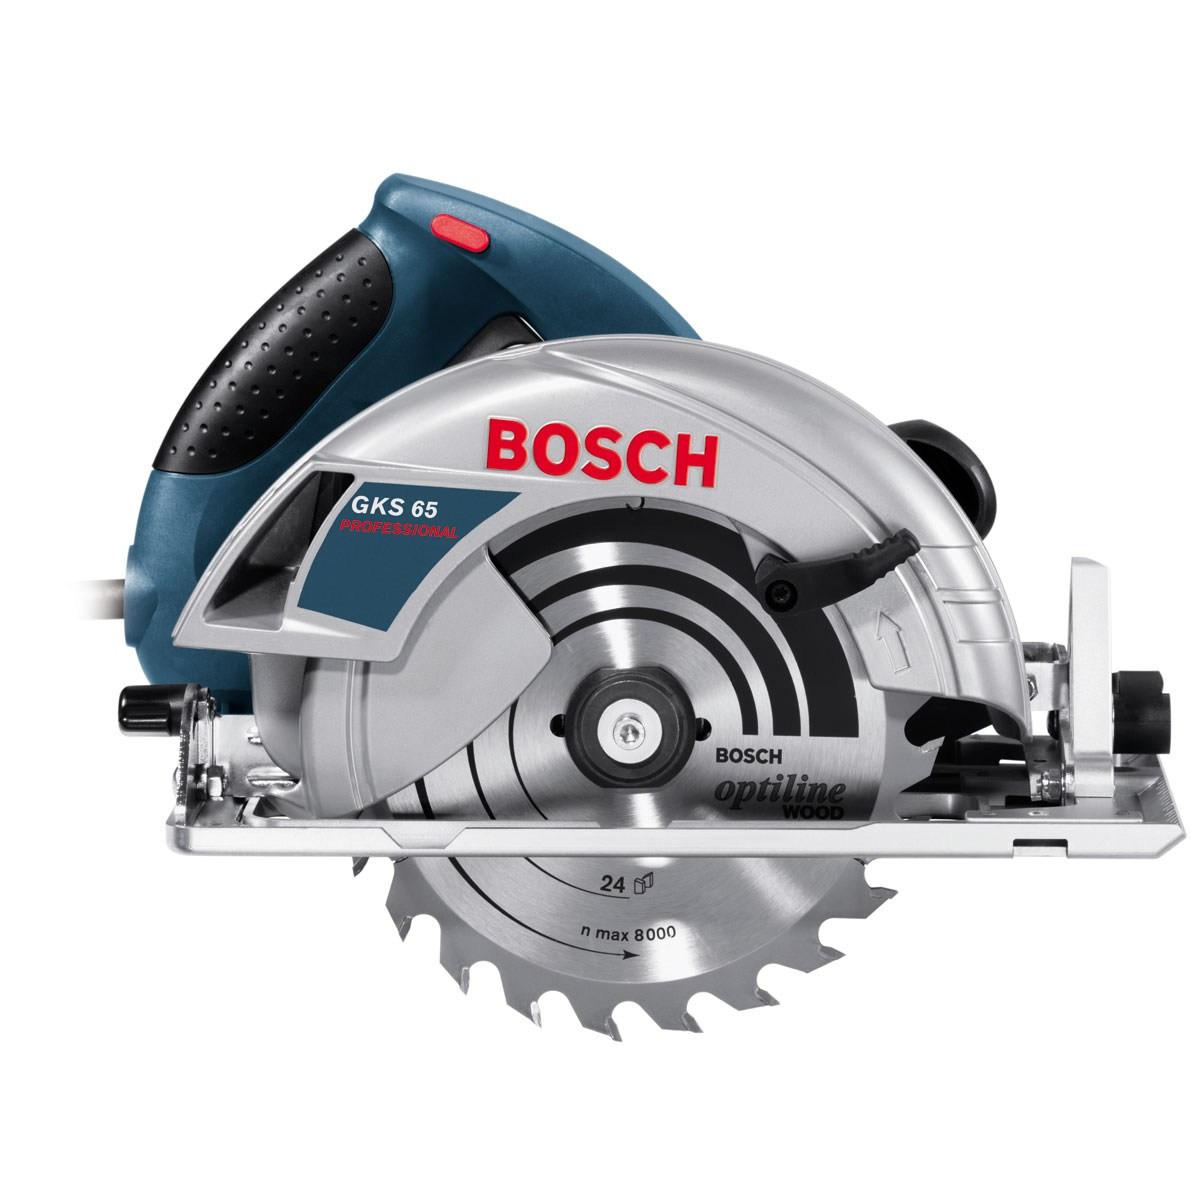 Пила дисковая Bosch  GKS 65 (1600W, 190 мм, пропил 65 мм, 4,8 кг.) 0601667000